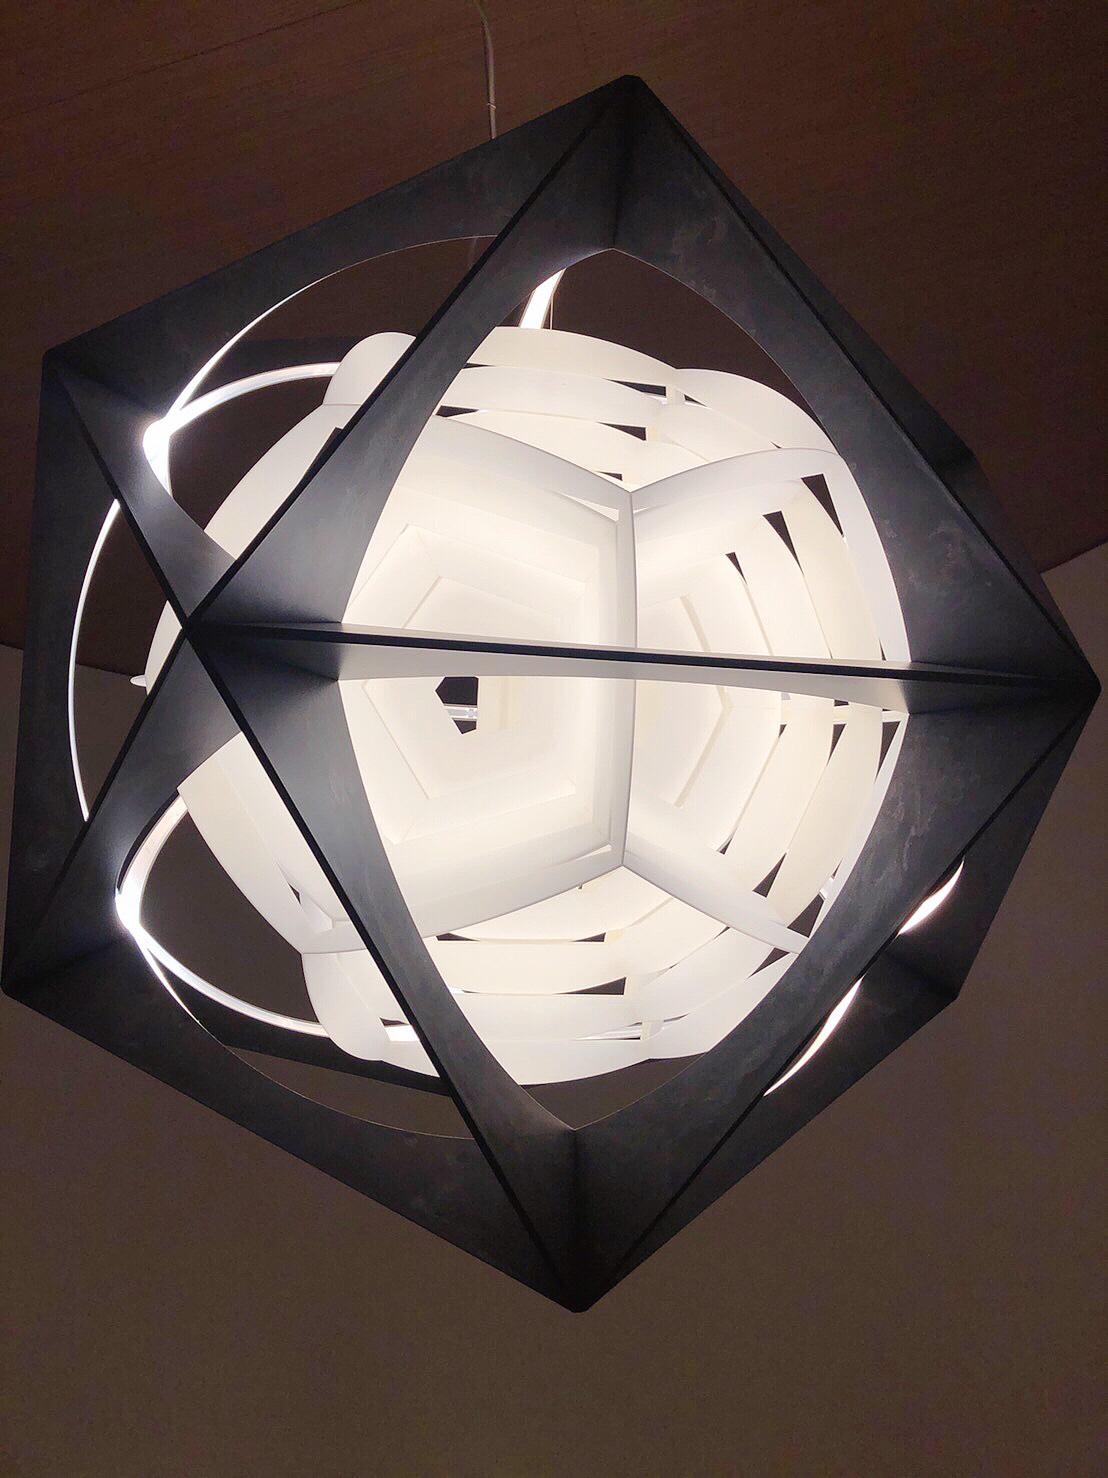 OE QUASI 吊燈 - 設計師 Olafur Eliasson 以幾何圖形概念作為發想,OE Quasi 吊燈有二十面體形狀的外部鋁框架、內嵌白色聚碳酸酯塑形而成的雙重十二面體。創作出不會造成環境負擔的產品,是設計師 Eliasson 的理想,因此燈具中使用的 90%鋁材,設計為可拆式零件,能夠重複使用,亦可回收。